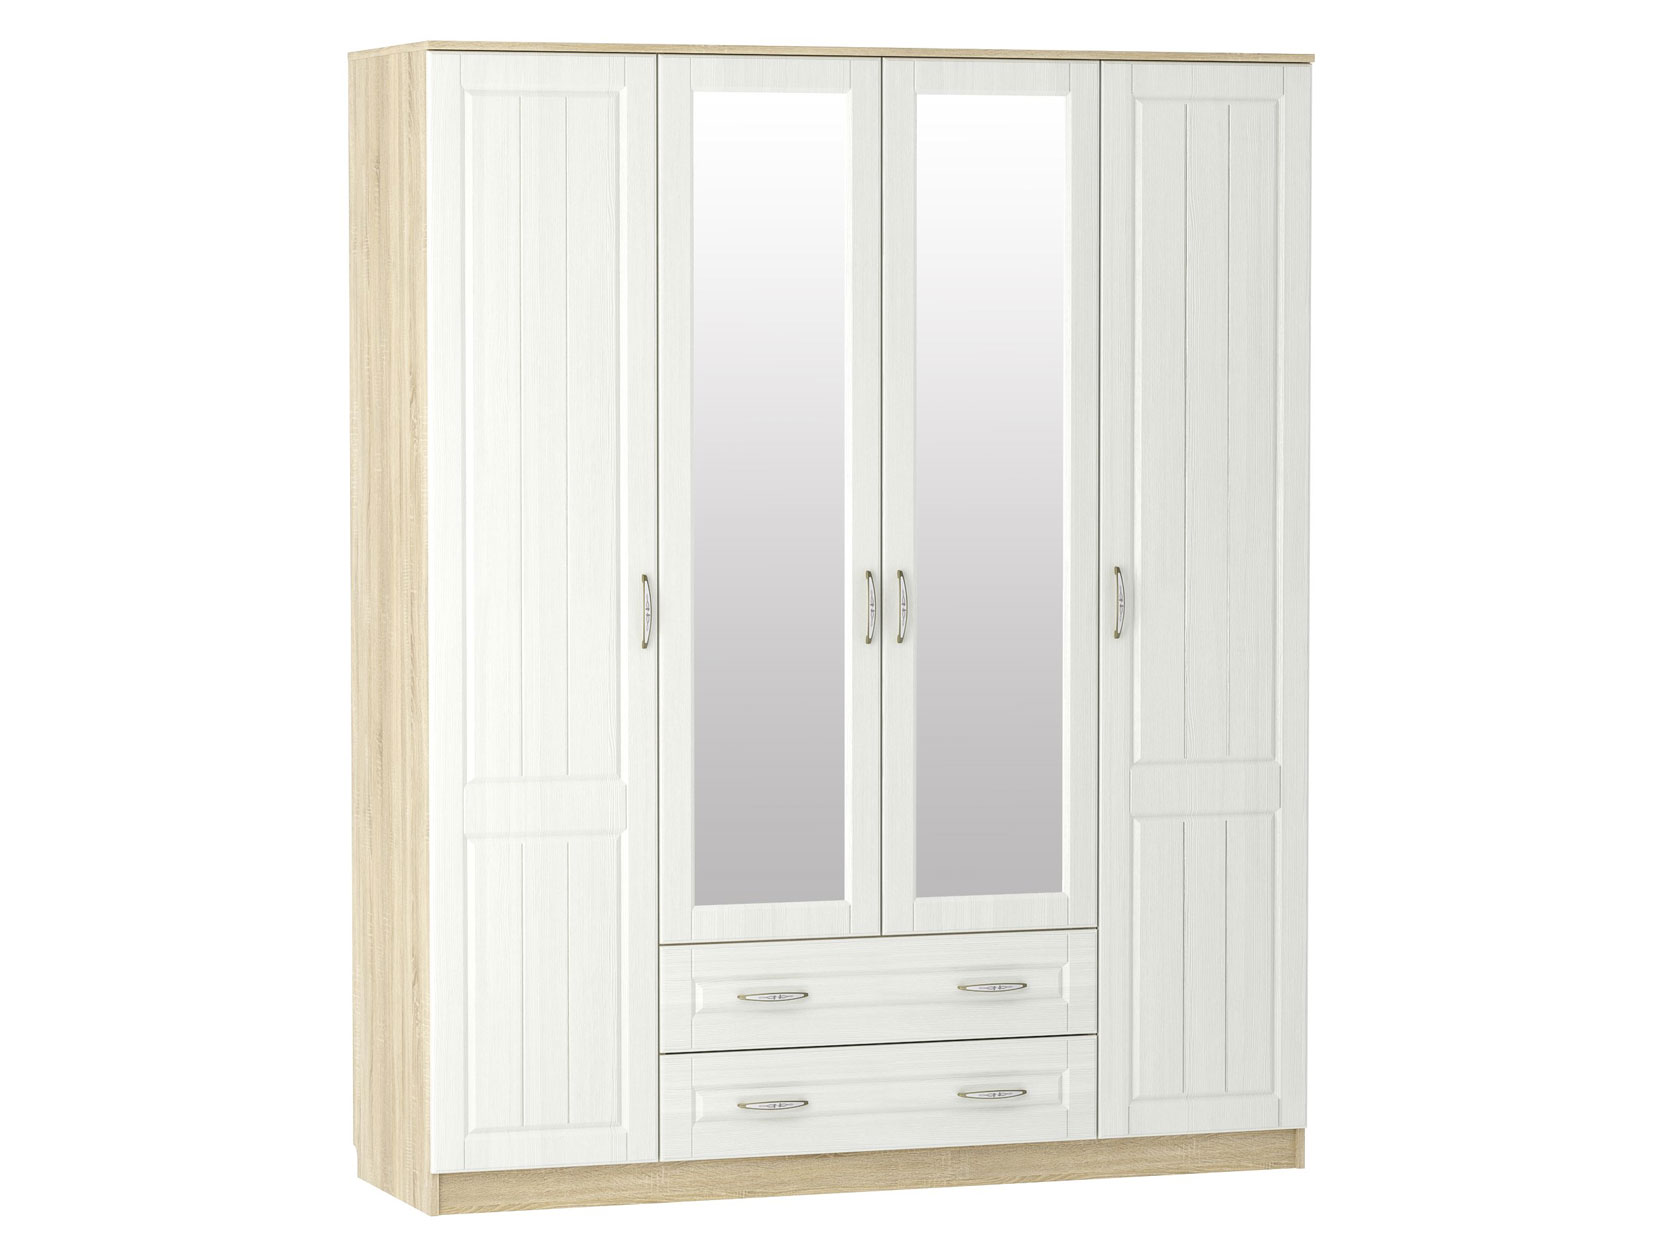 Распашной шкаф Оливия Лайт